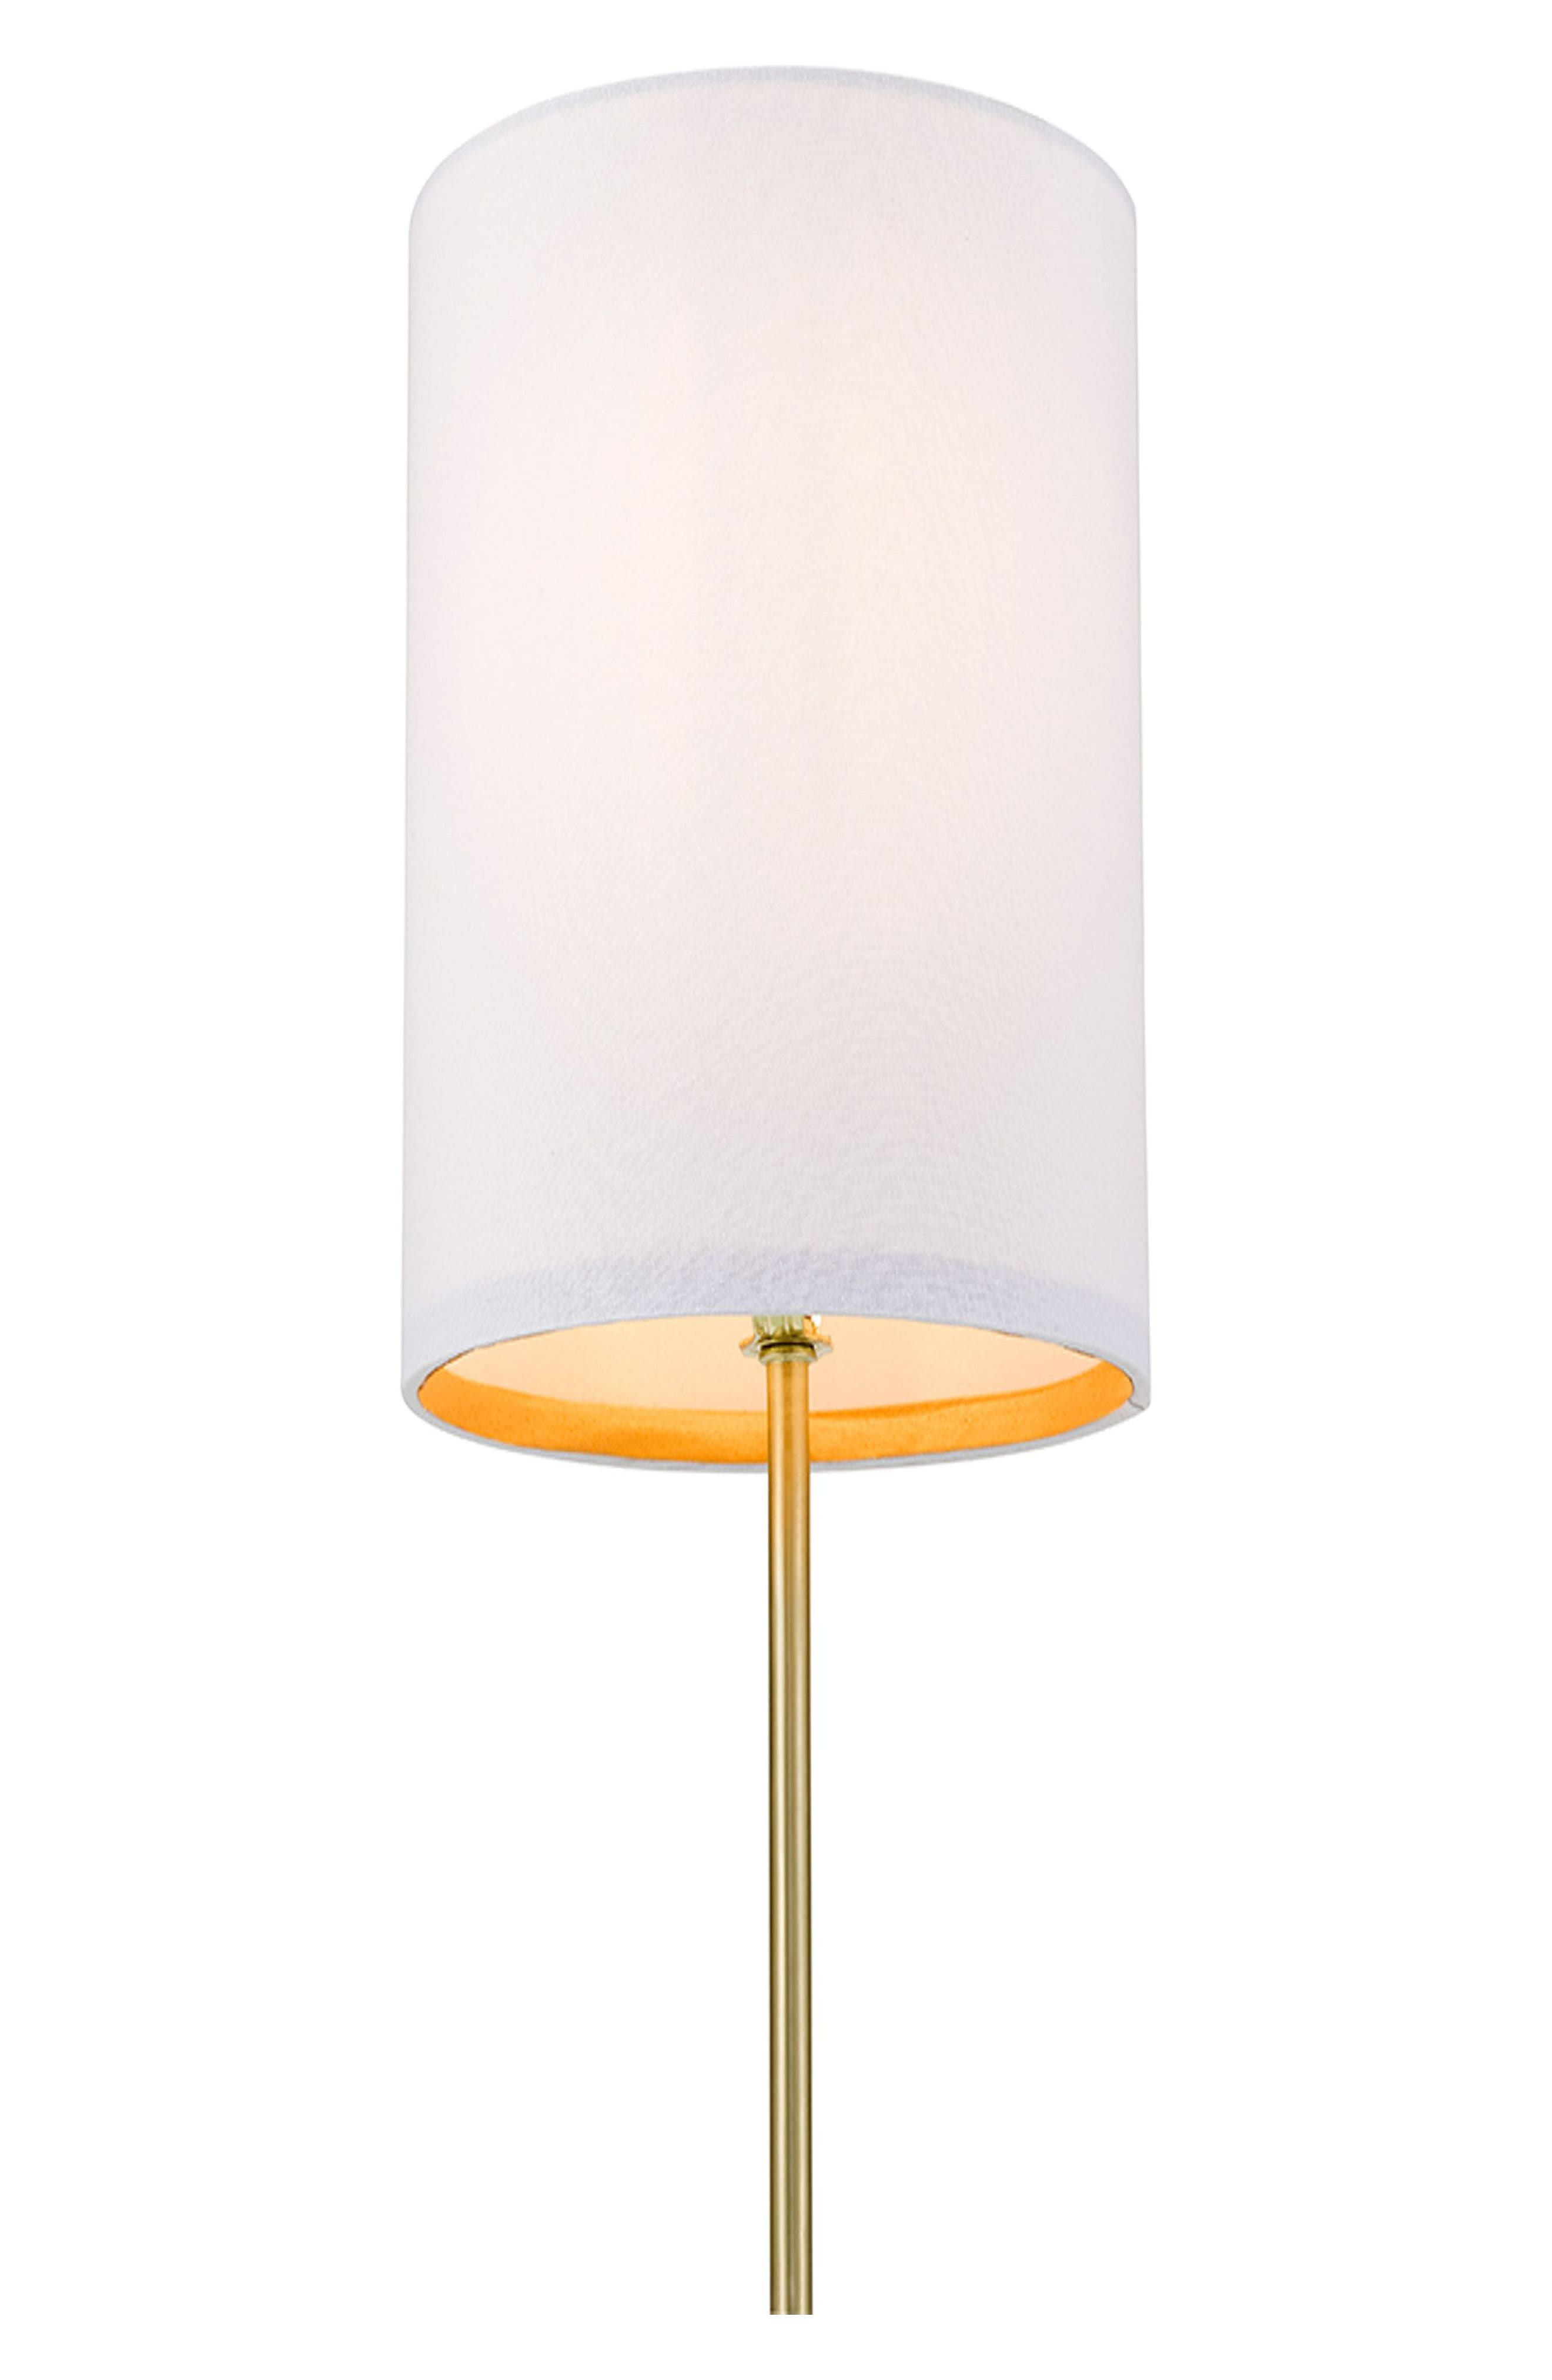 Elemental Table Lamp,                             Alternate thumbnail 2, color,                             100